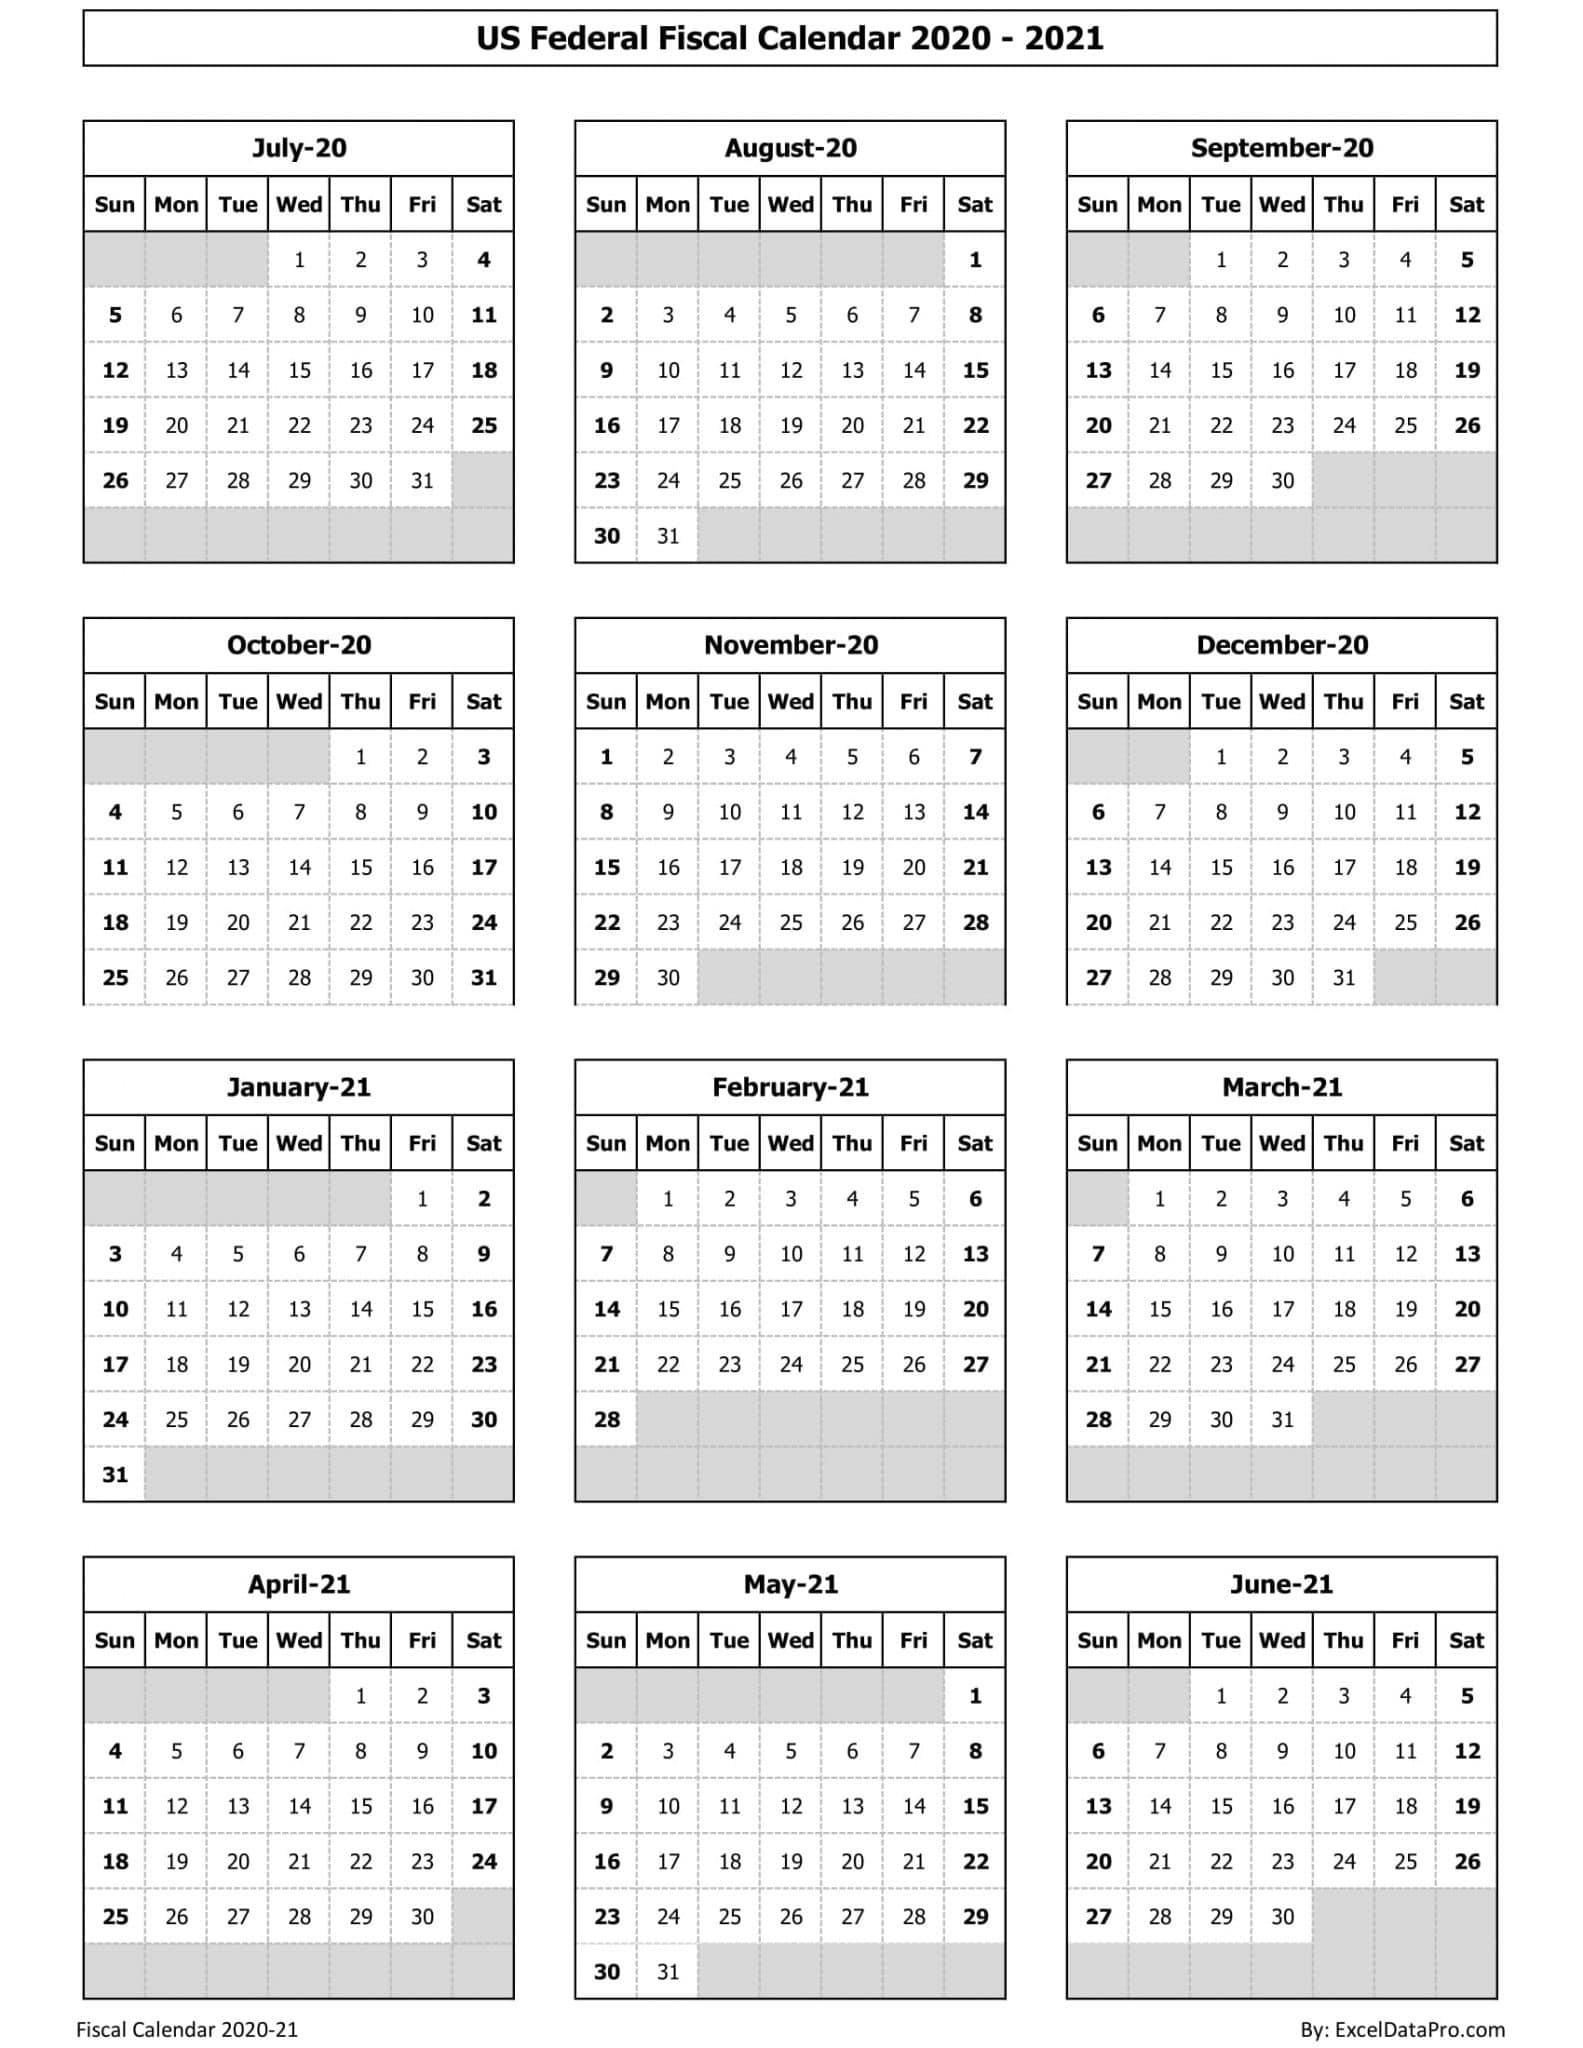 Edi Suparman - Page 17 - Template Calendar Design  Fiscal Year Autralia